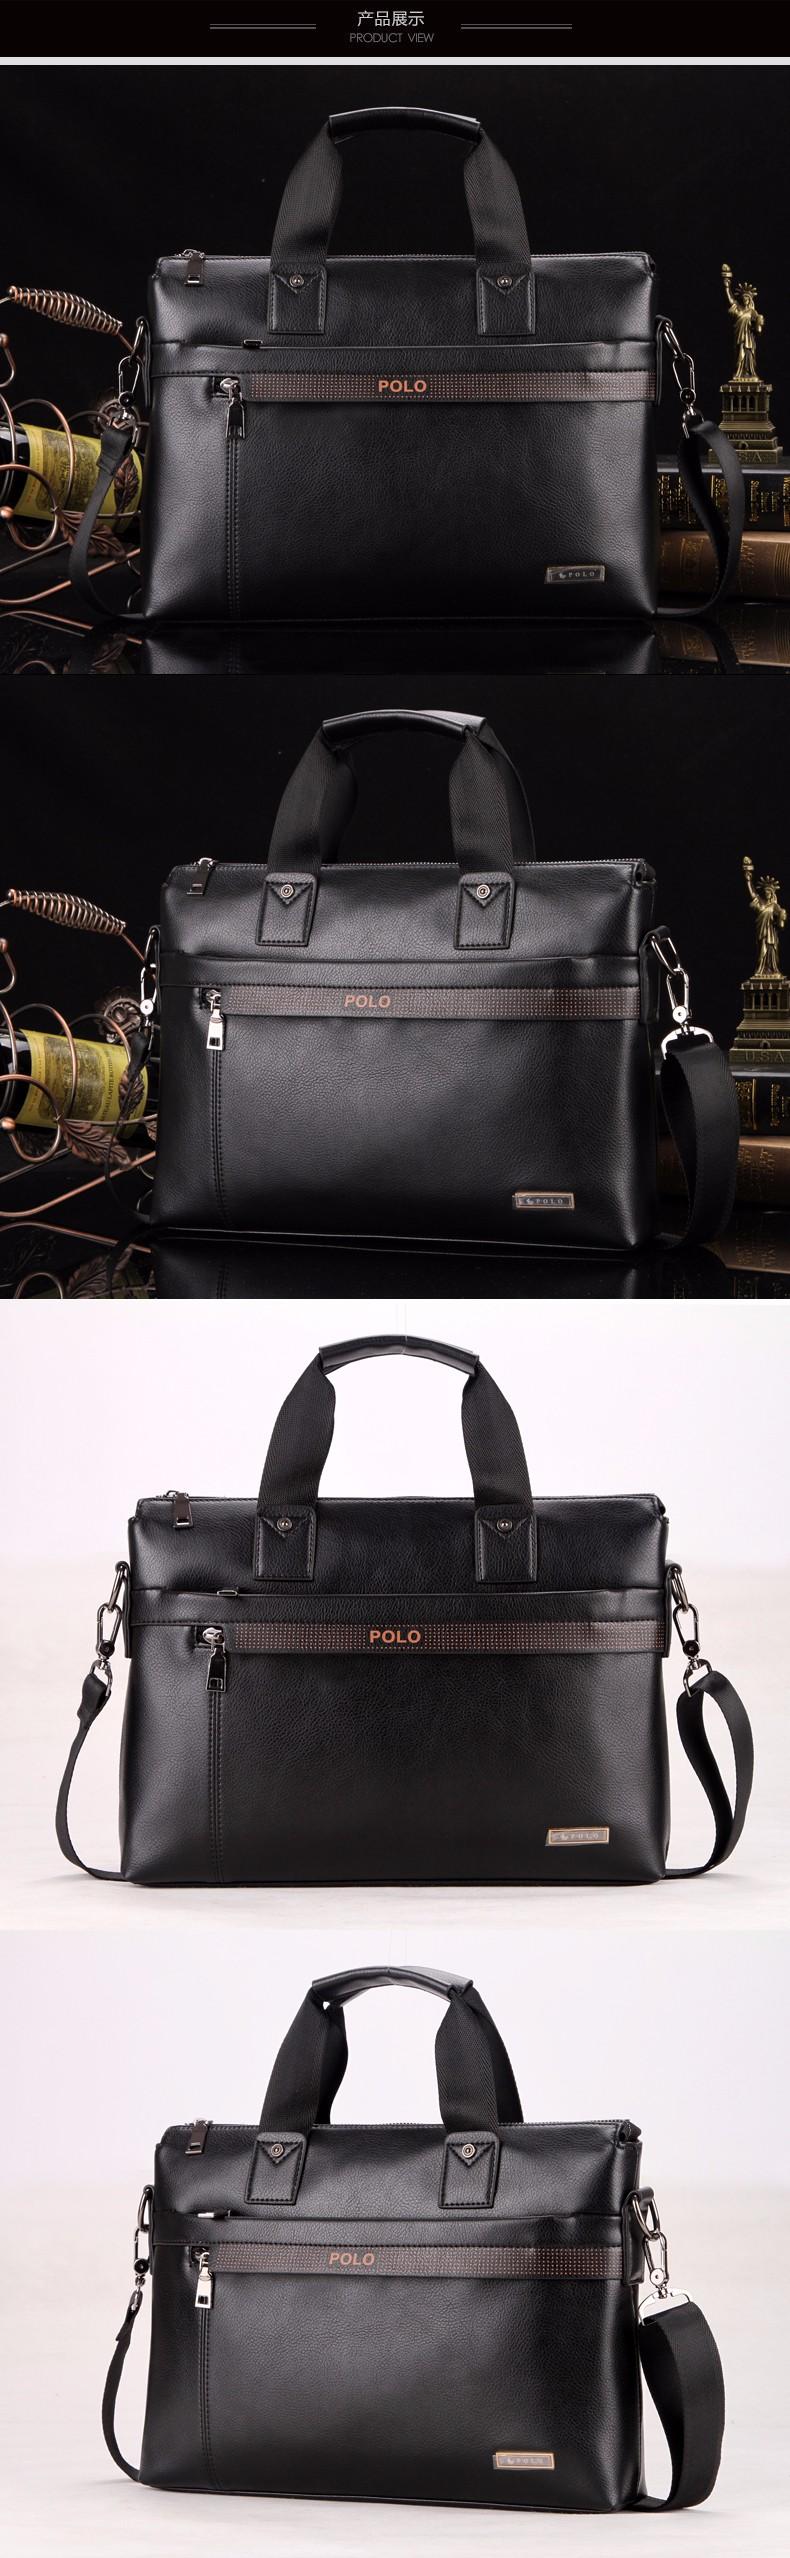 Fashion Brand PU Leather Men s Handbags Designer Man Zipper Handbag Dress Messenger  Bag for Men Brown Black Color XB114NEW-in Crossbody Bags from Luggage ... 401b77e793325